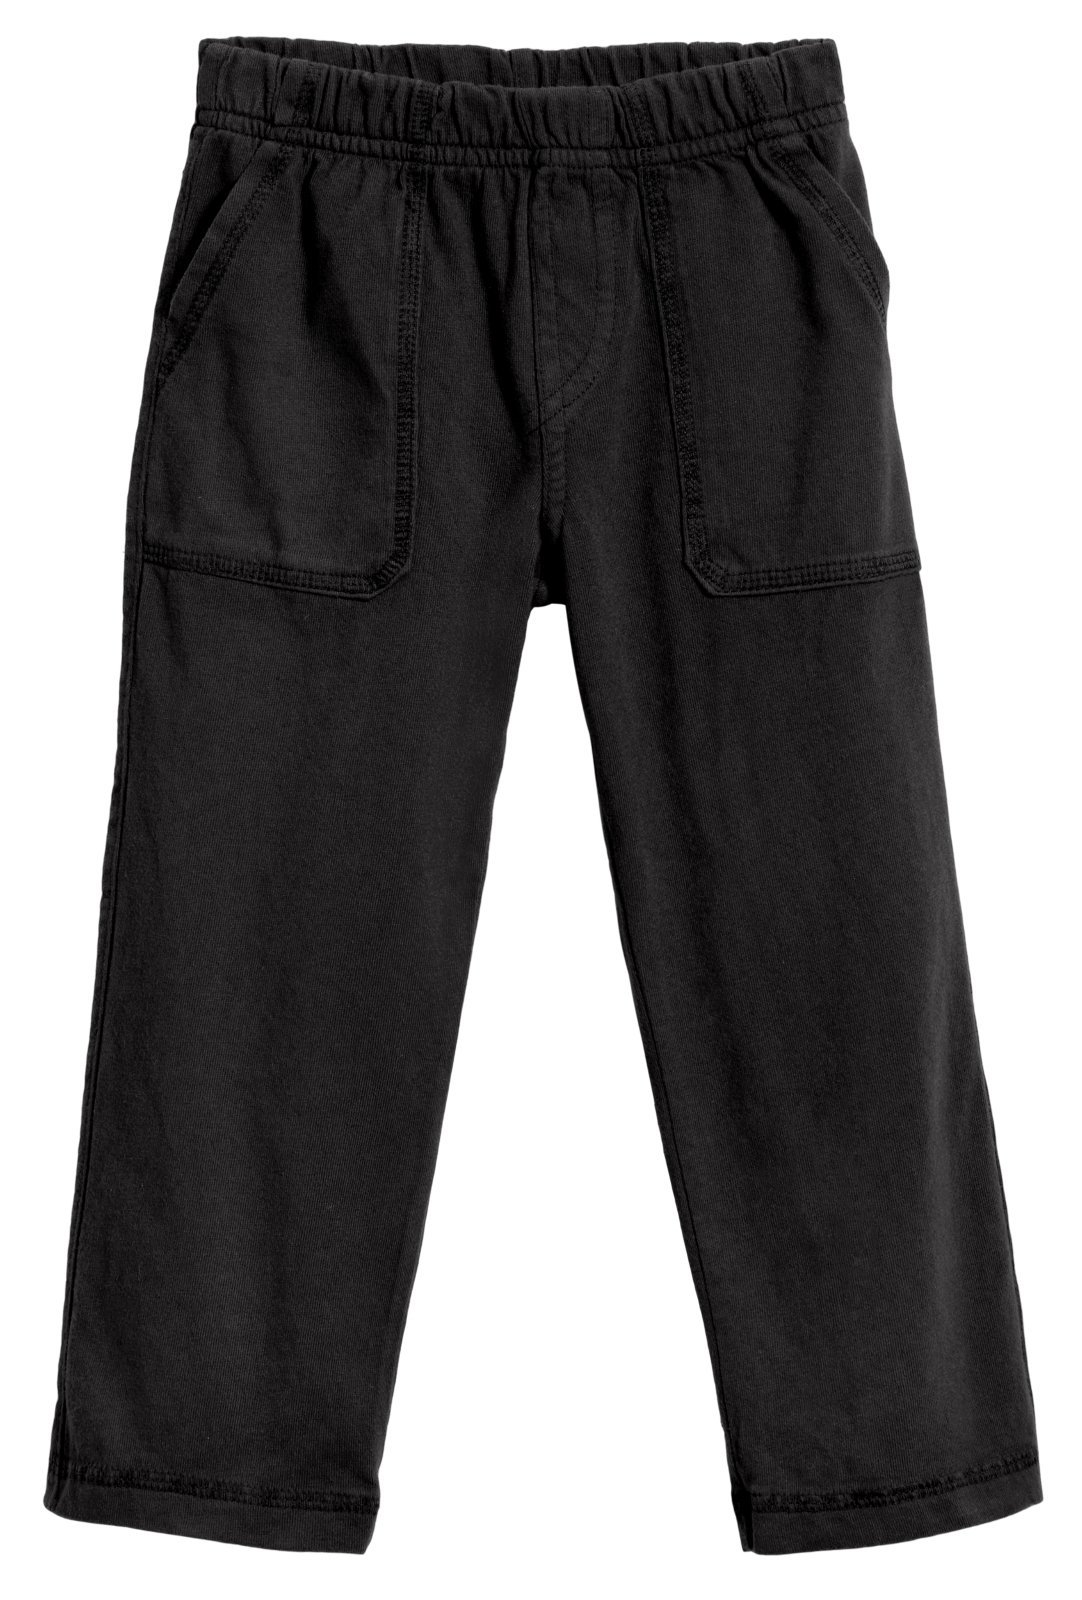 City Threads Big Boys' and Girls' Soft Jersey Tonal Stitch Pant Perfect for Sensitive Skin SPD Sensory Friendly Clothing - Black 10